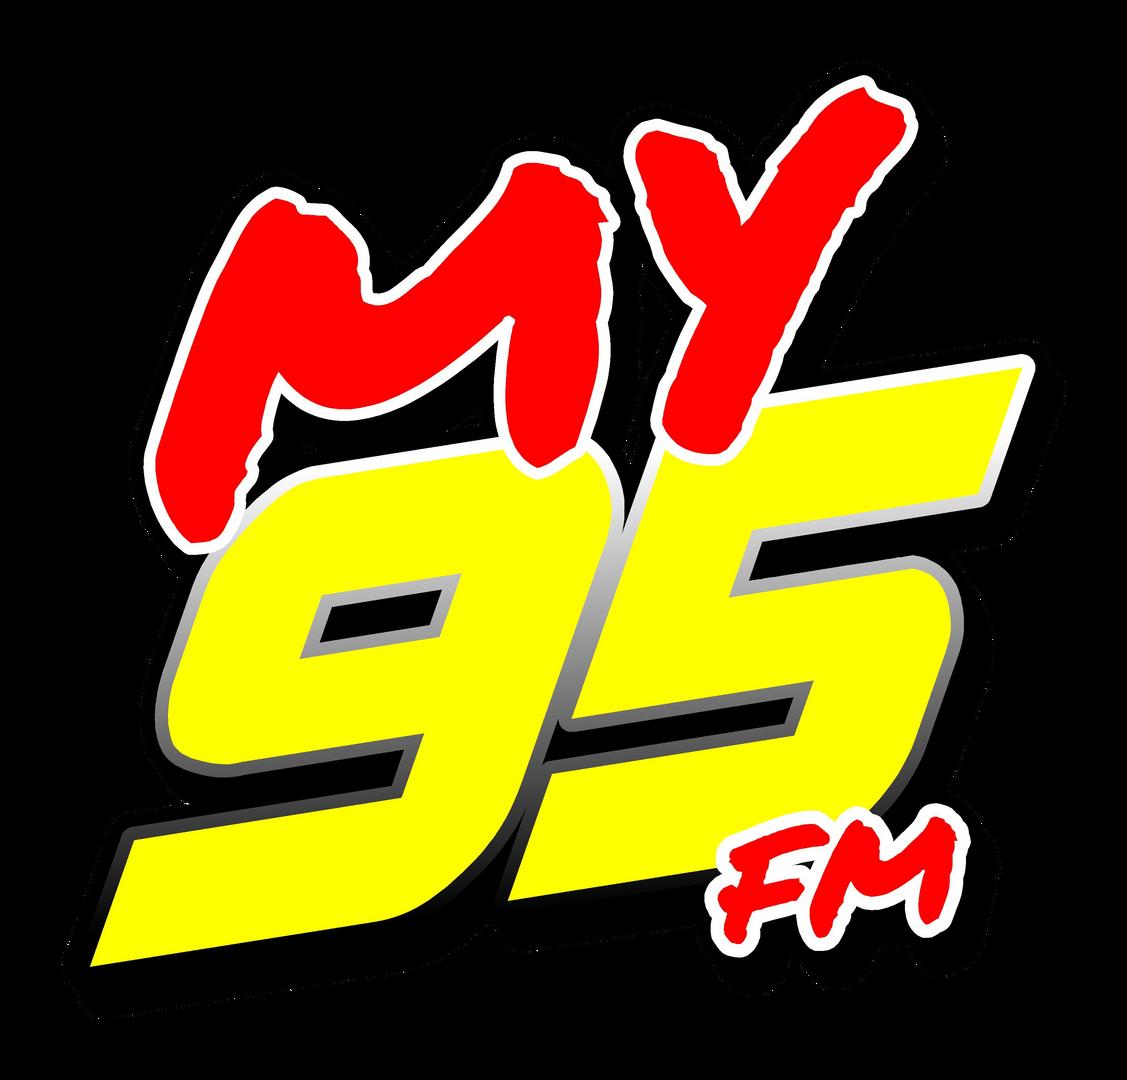 MY 95 logo.png